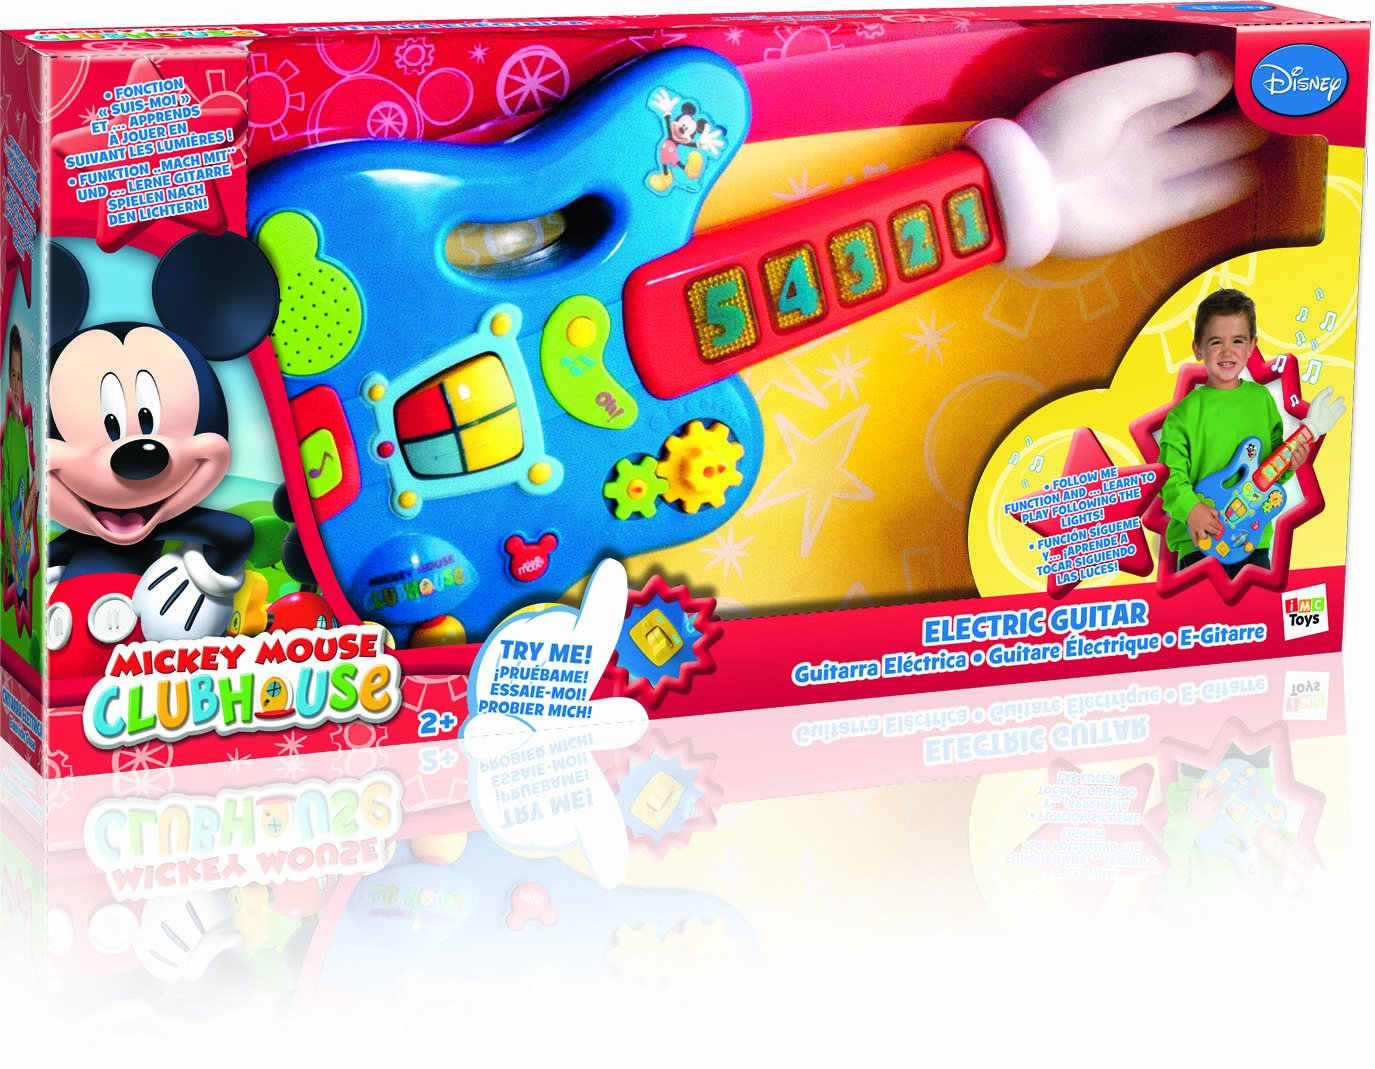 Mickey Mouse 180109 - Elektronische Gitarre: Amazon.de: Spielzeug